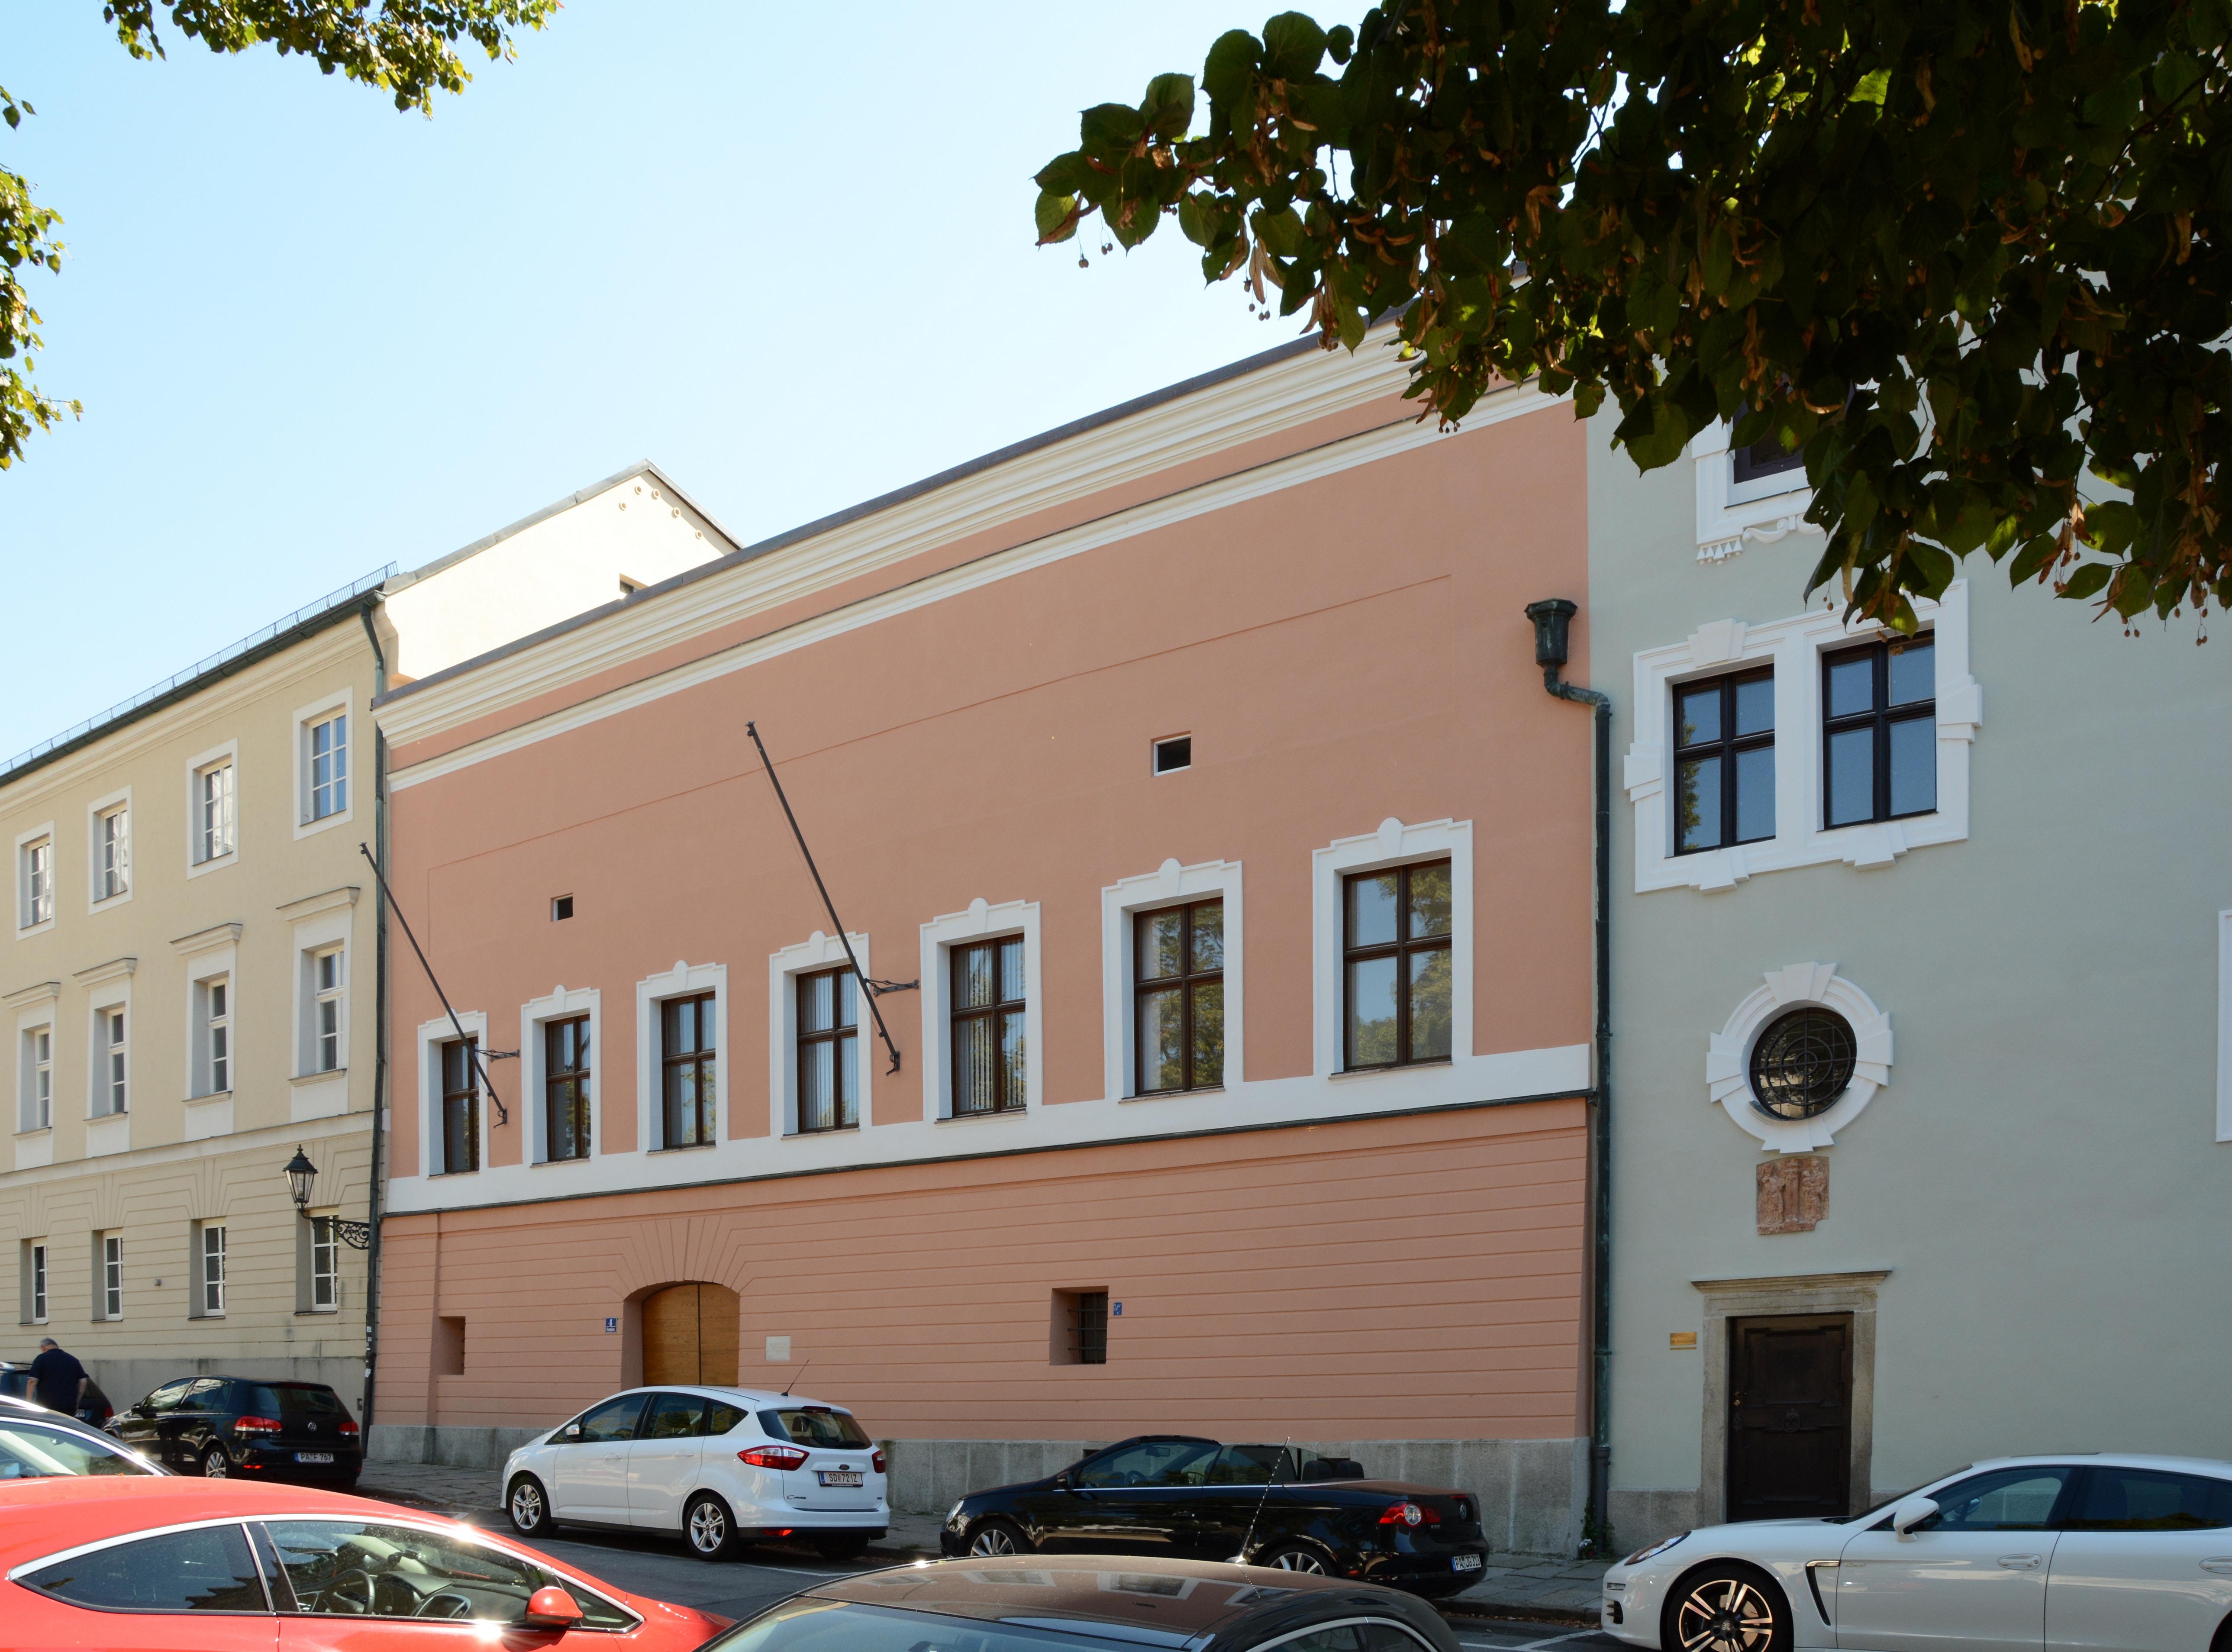 Filedomplatz 4 Passau Cjpg Wikimedia Commons